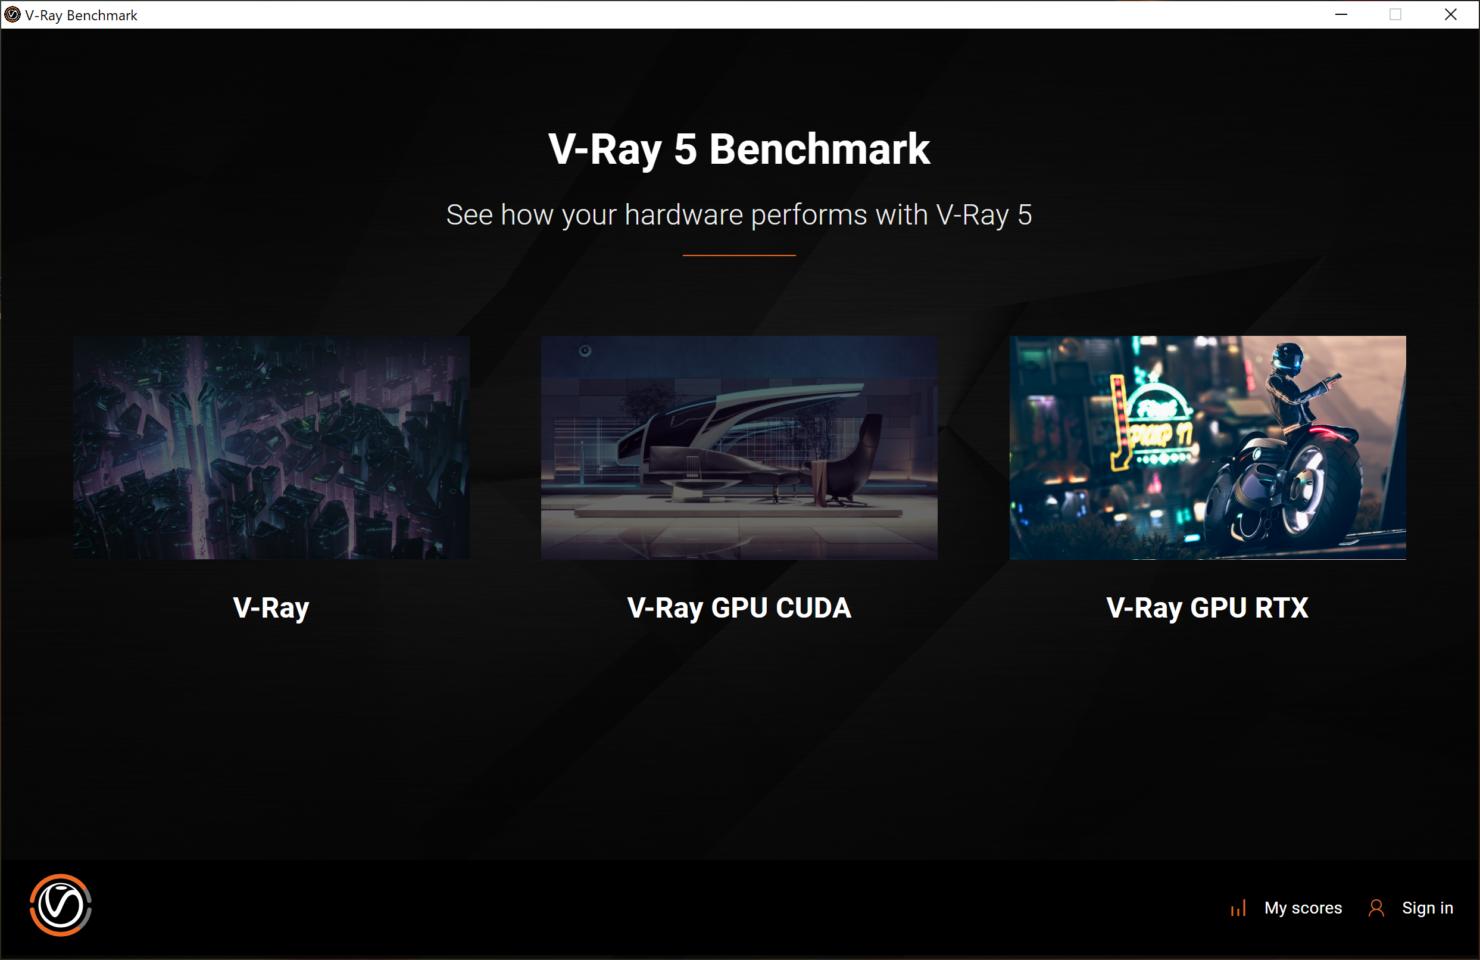 04-vray-5-benchmark-home-rtx-2